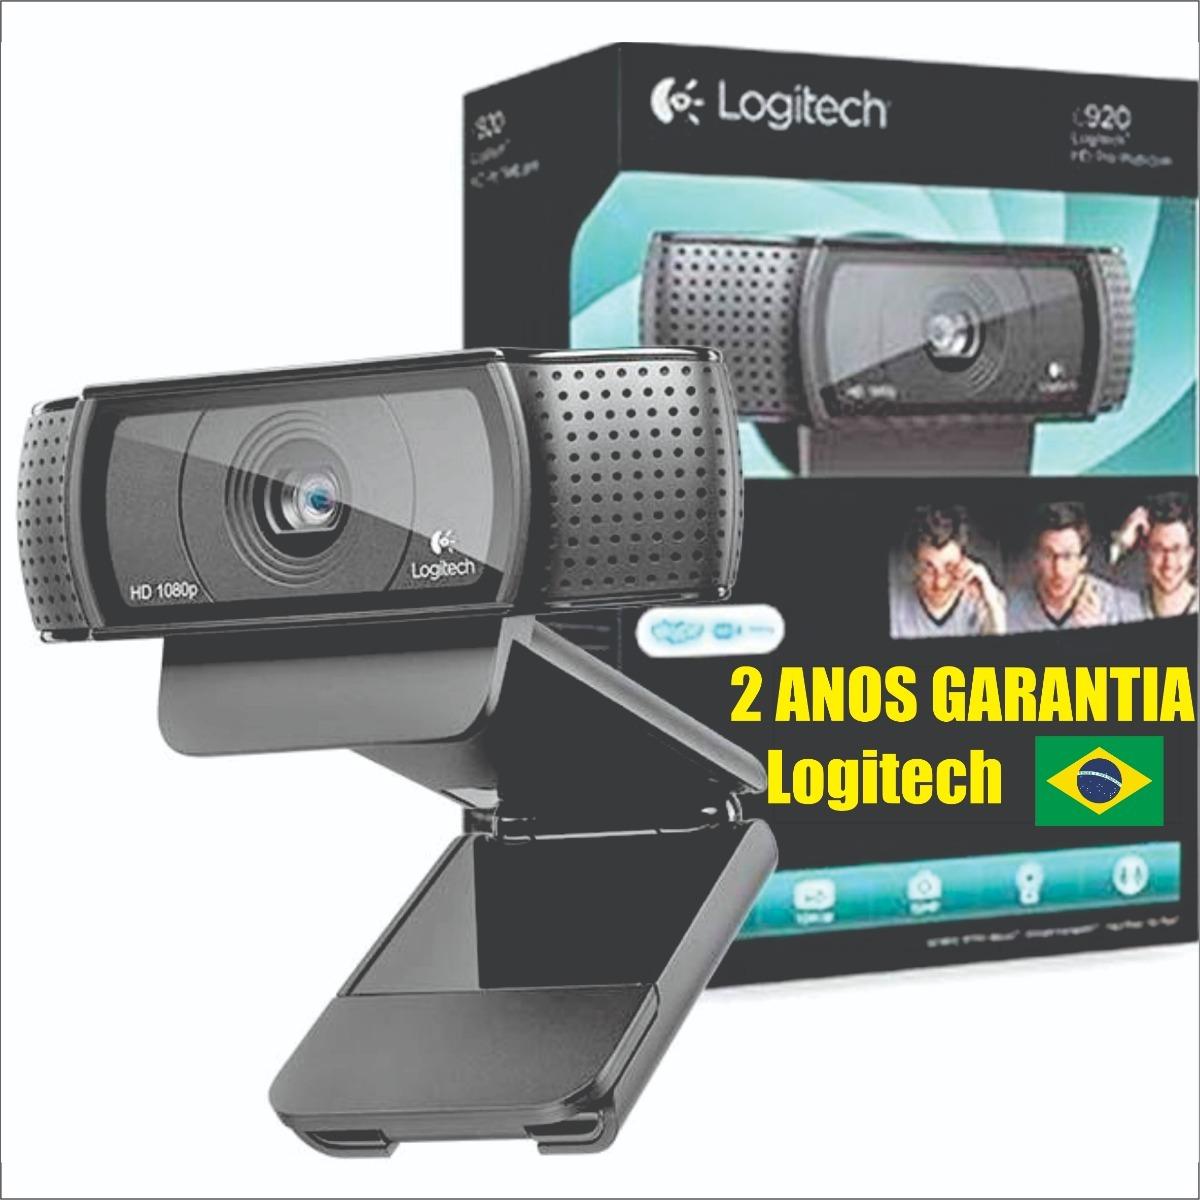 C920 Logitech Control